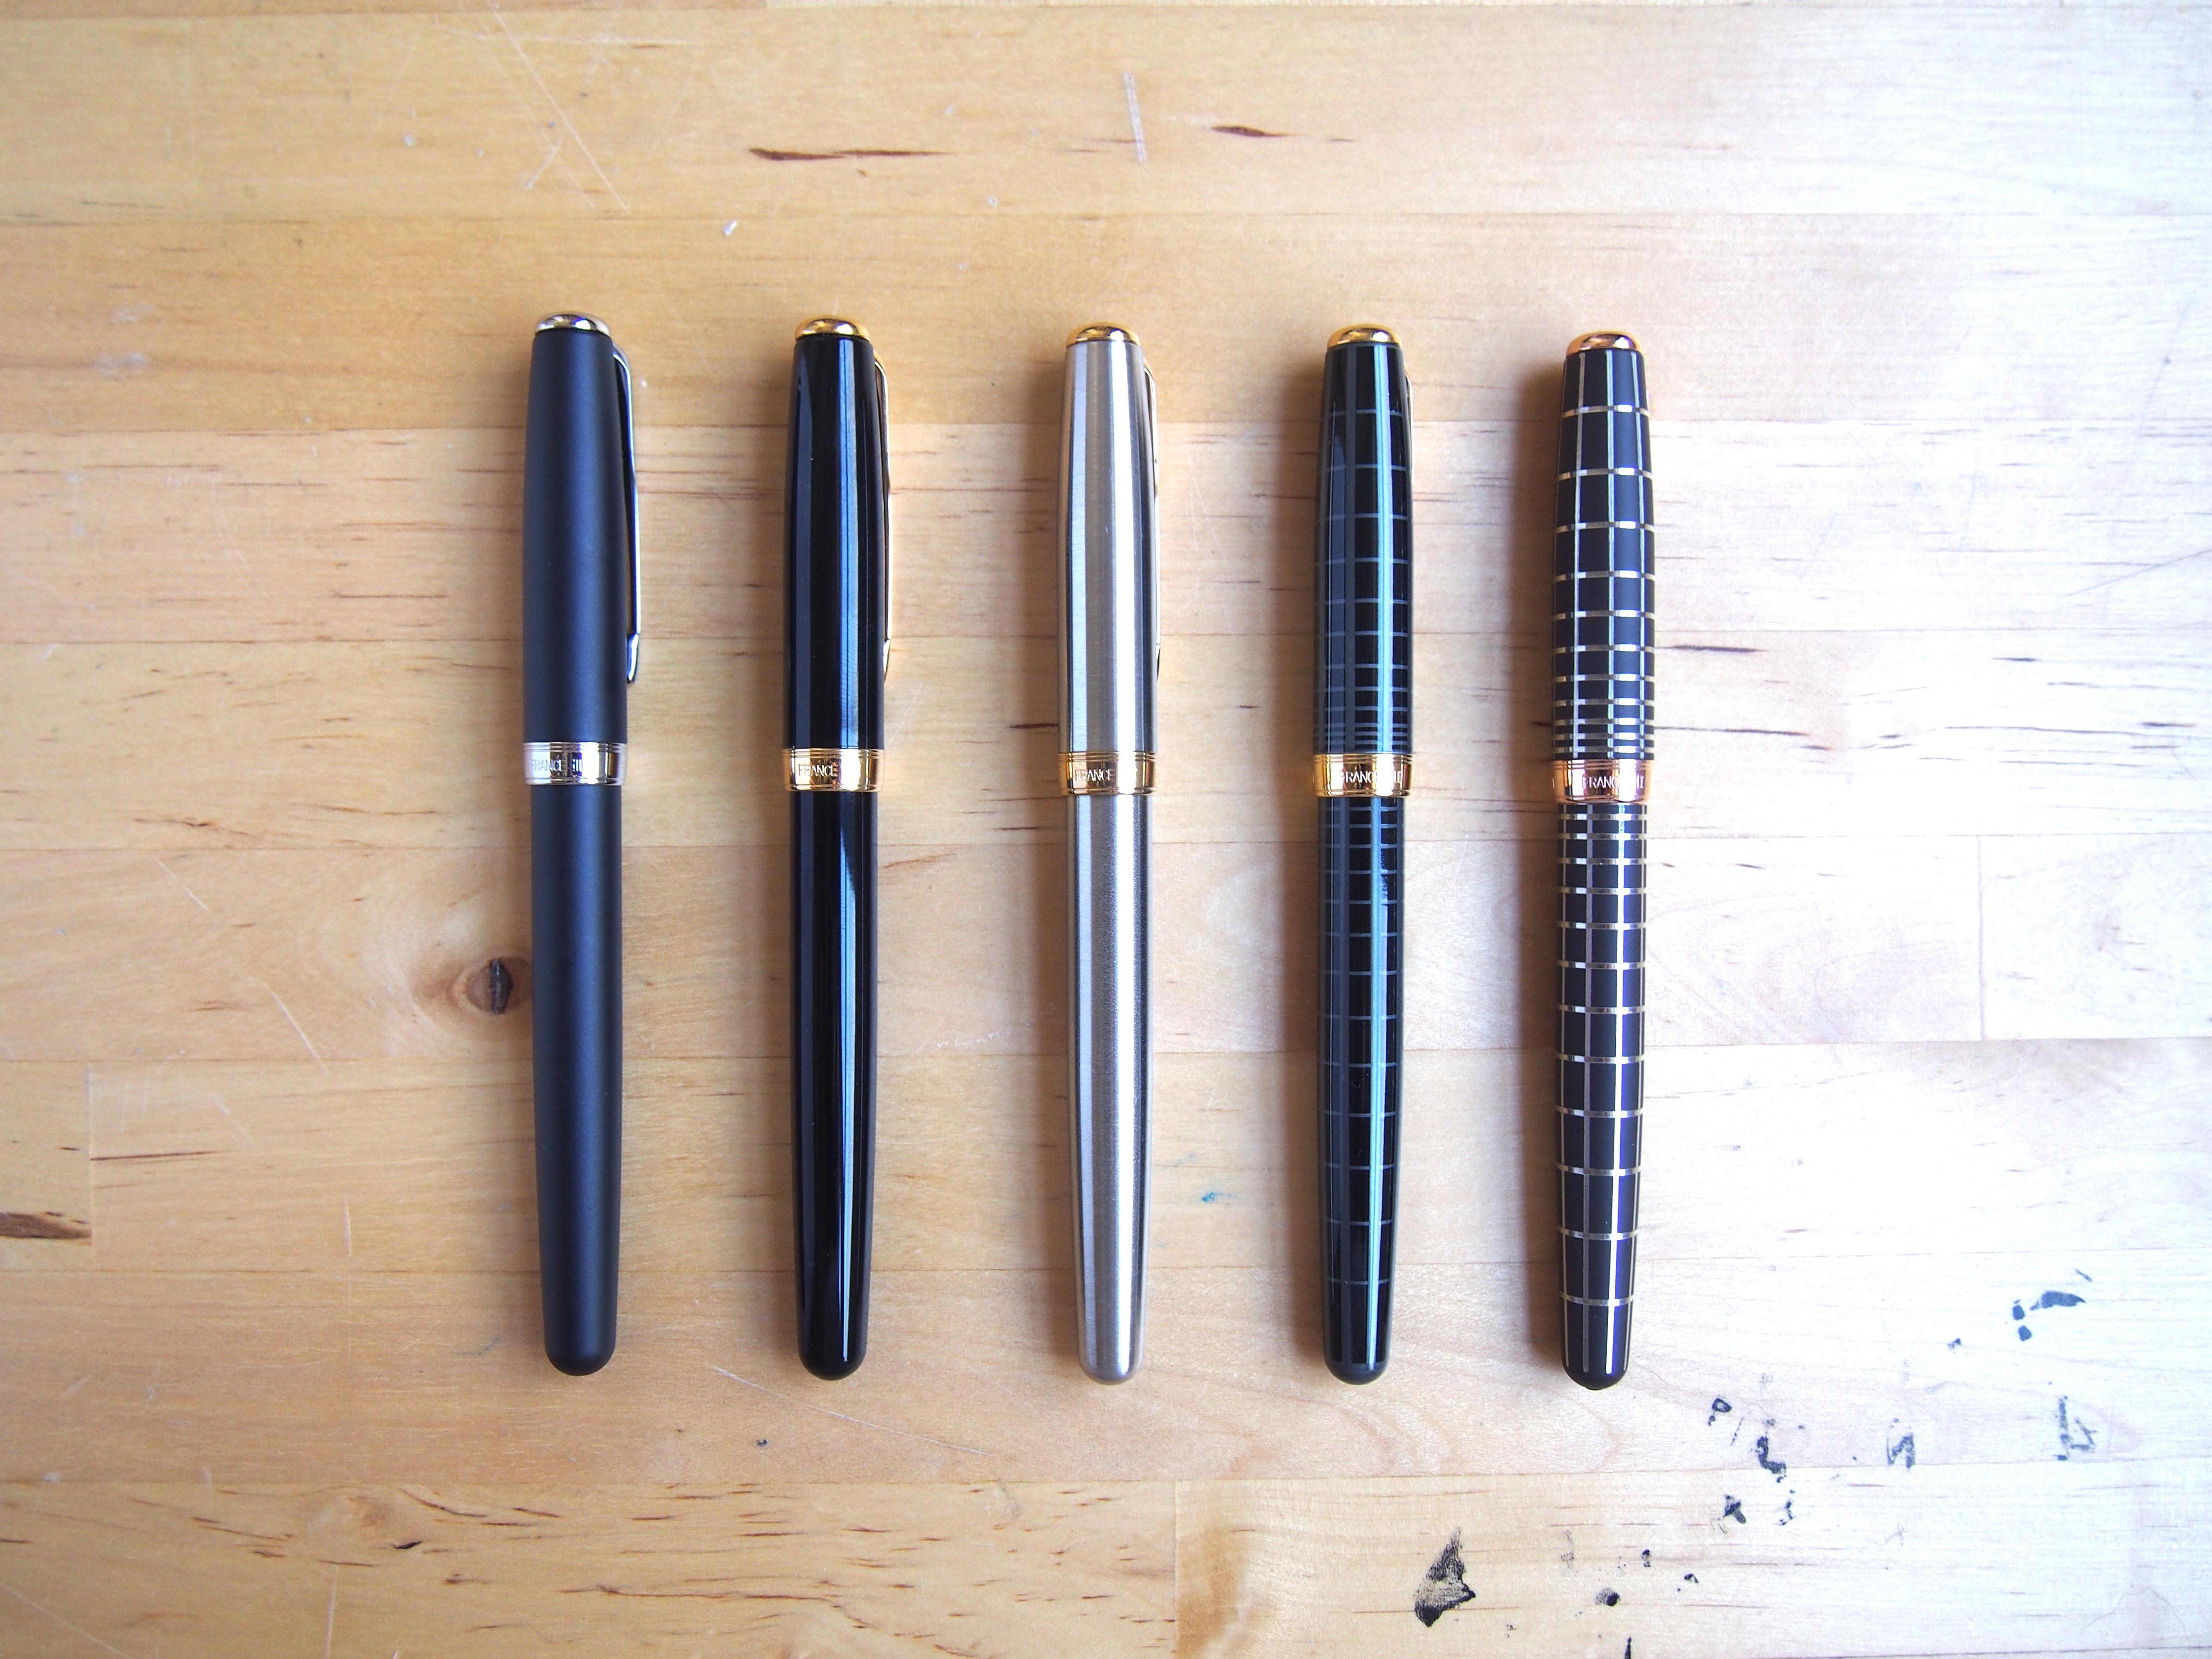 Parker Sonnet Fountain Pen Toronto Canada Wonder Pens Blog wonderpens.ca